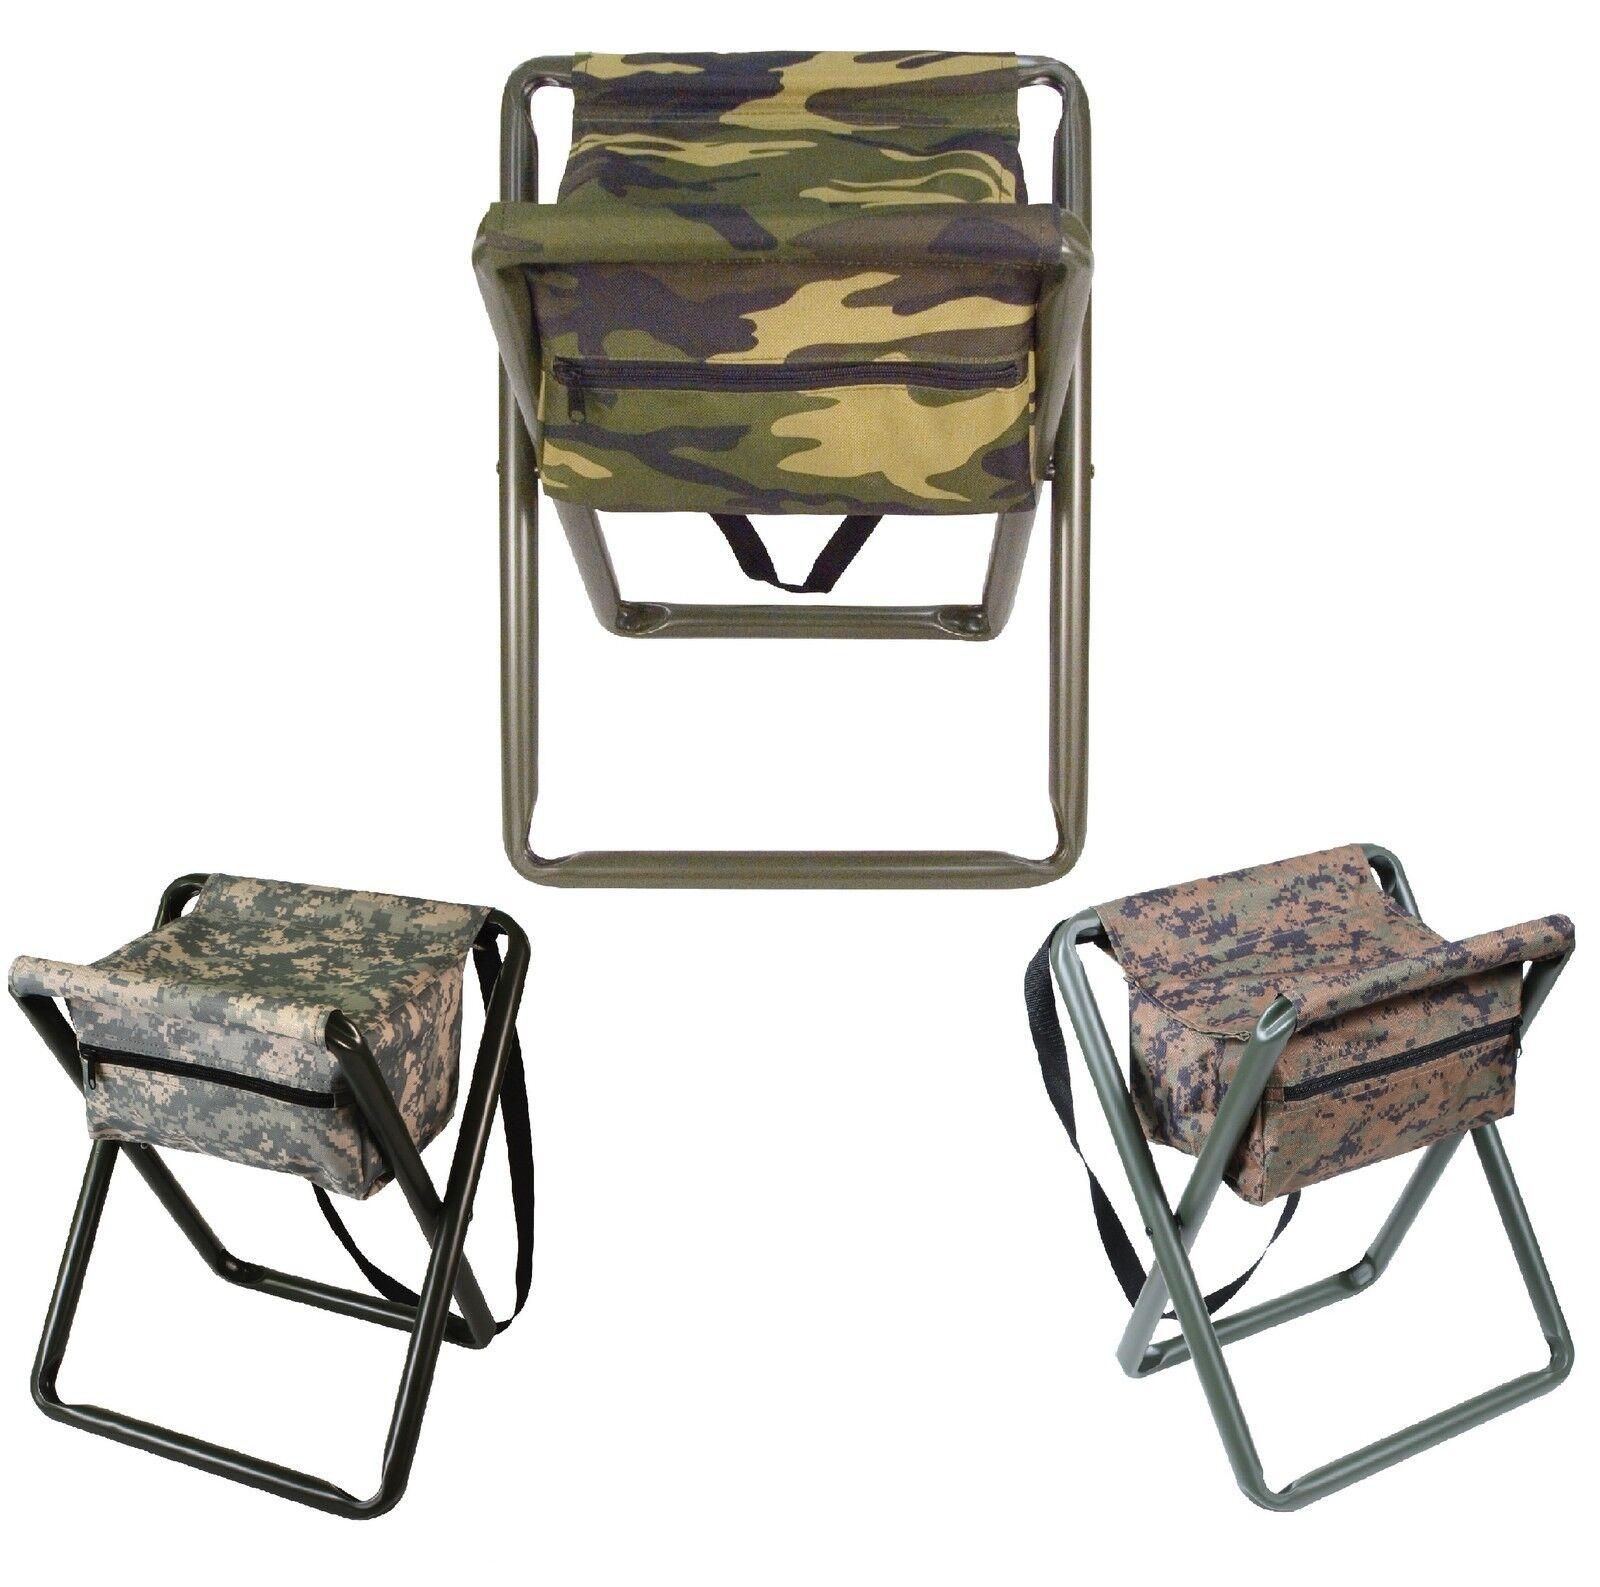 Deluxe Camo Folding Camp Stool W Pouch - Woodland, ACU Digital, Woodland Digital